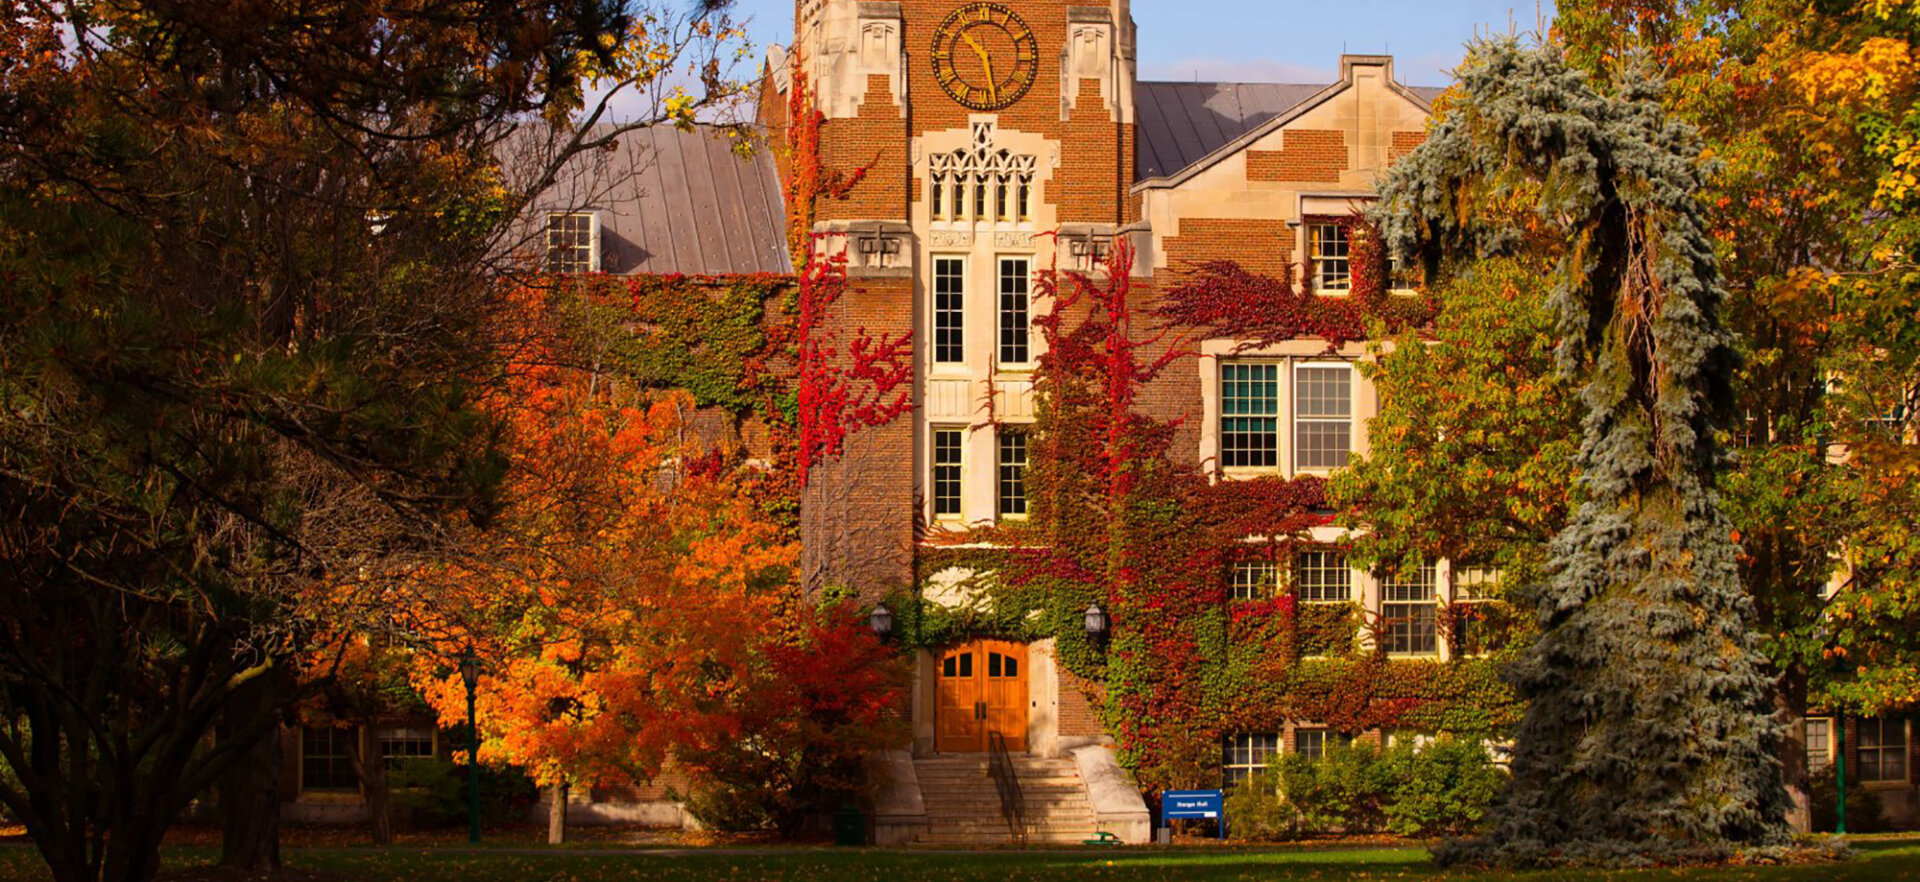 SUNY Geneseo building Sturges Hall